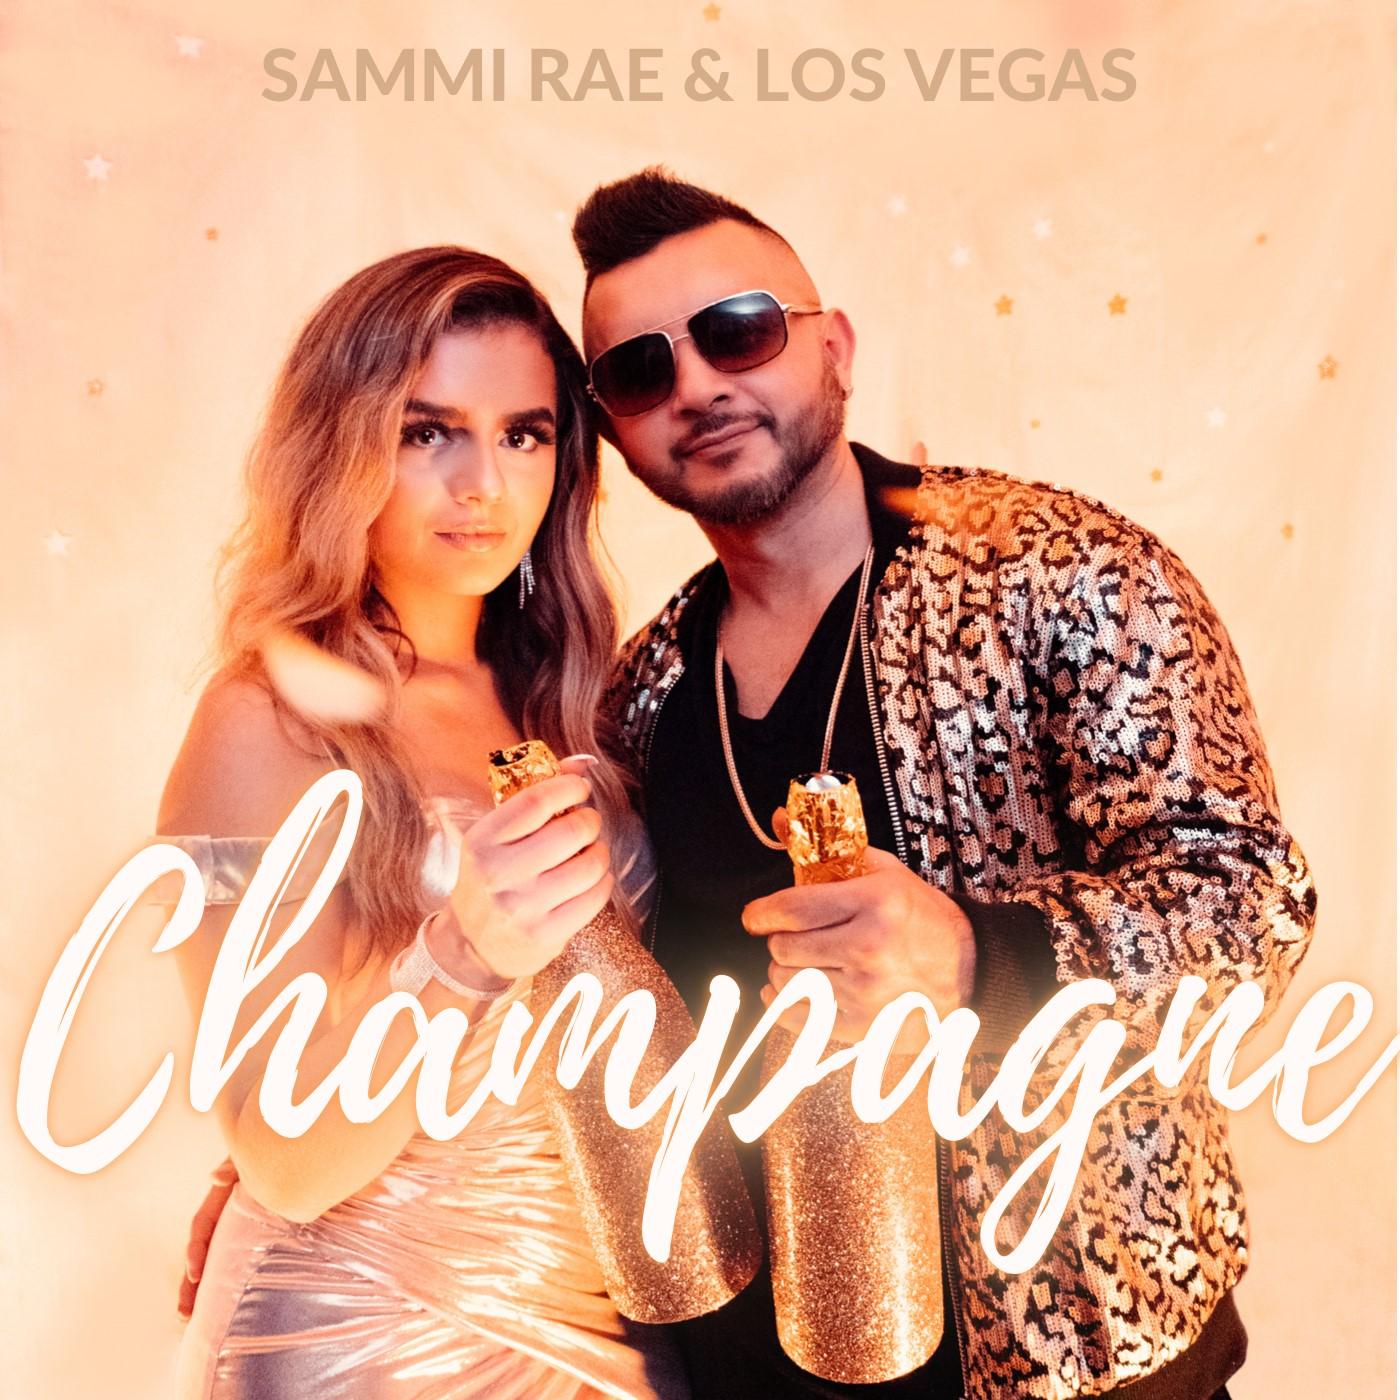 Sammi Rae & Los Vegas Celebrate the Premiere of Sensational Single 'Champagne'